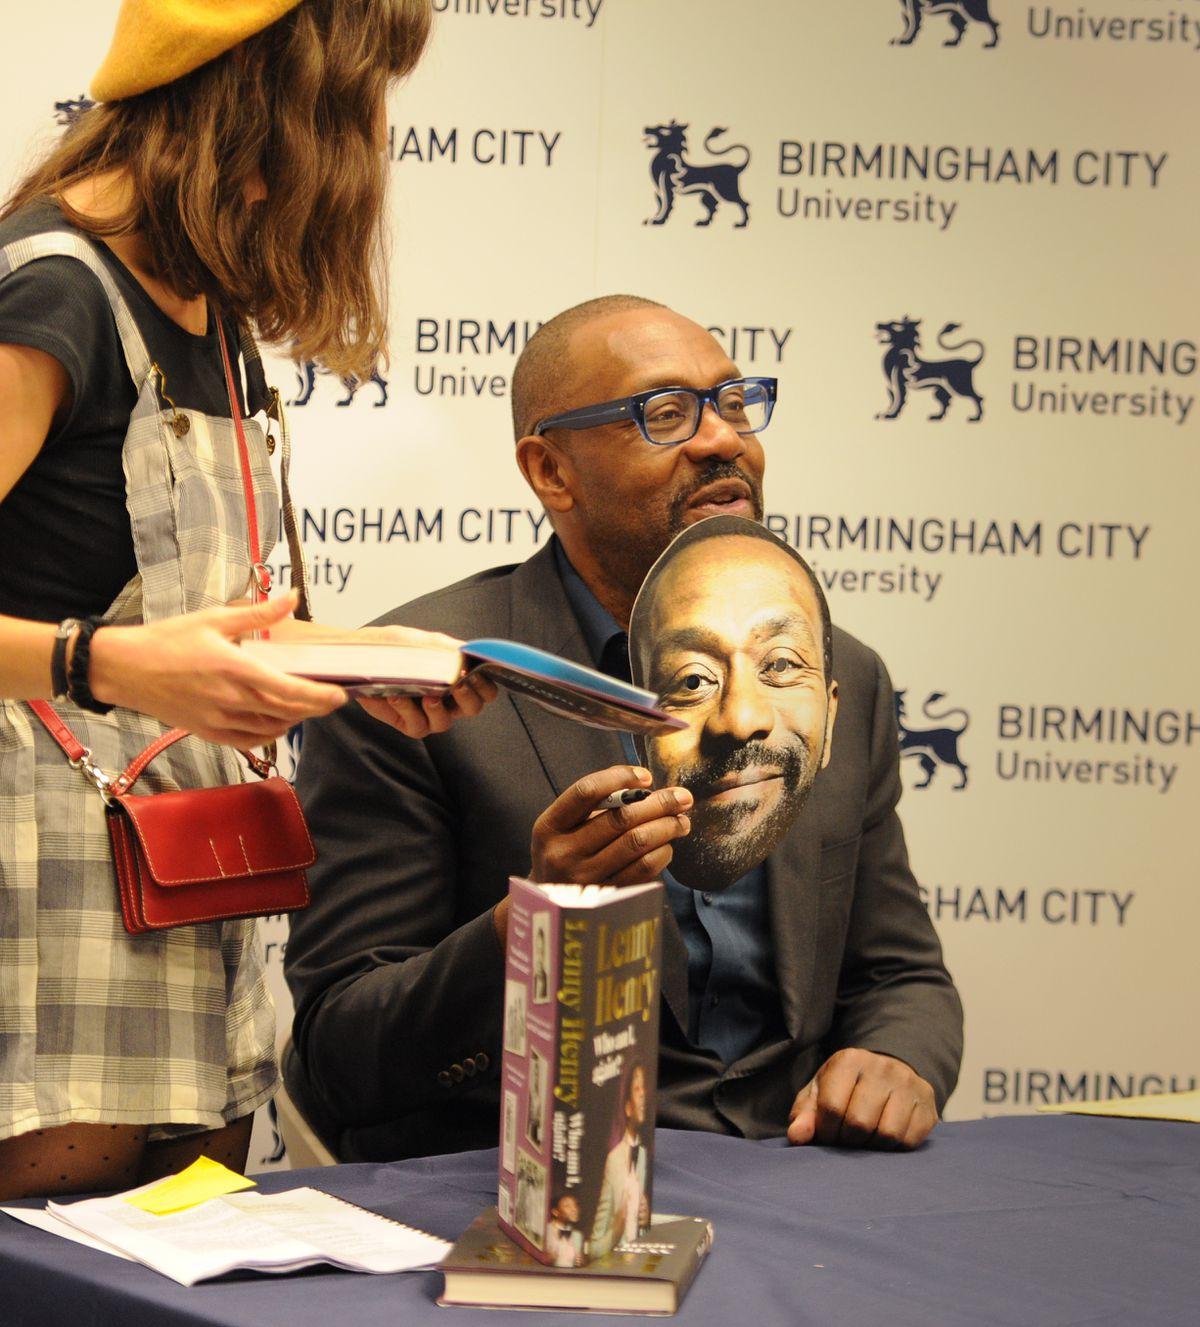 Sir Lenny Henry at Birmingham City University